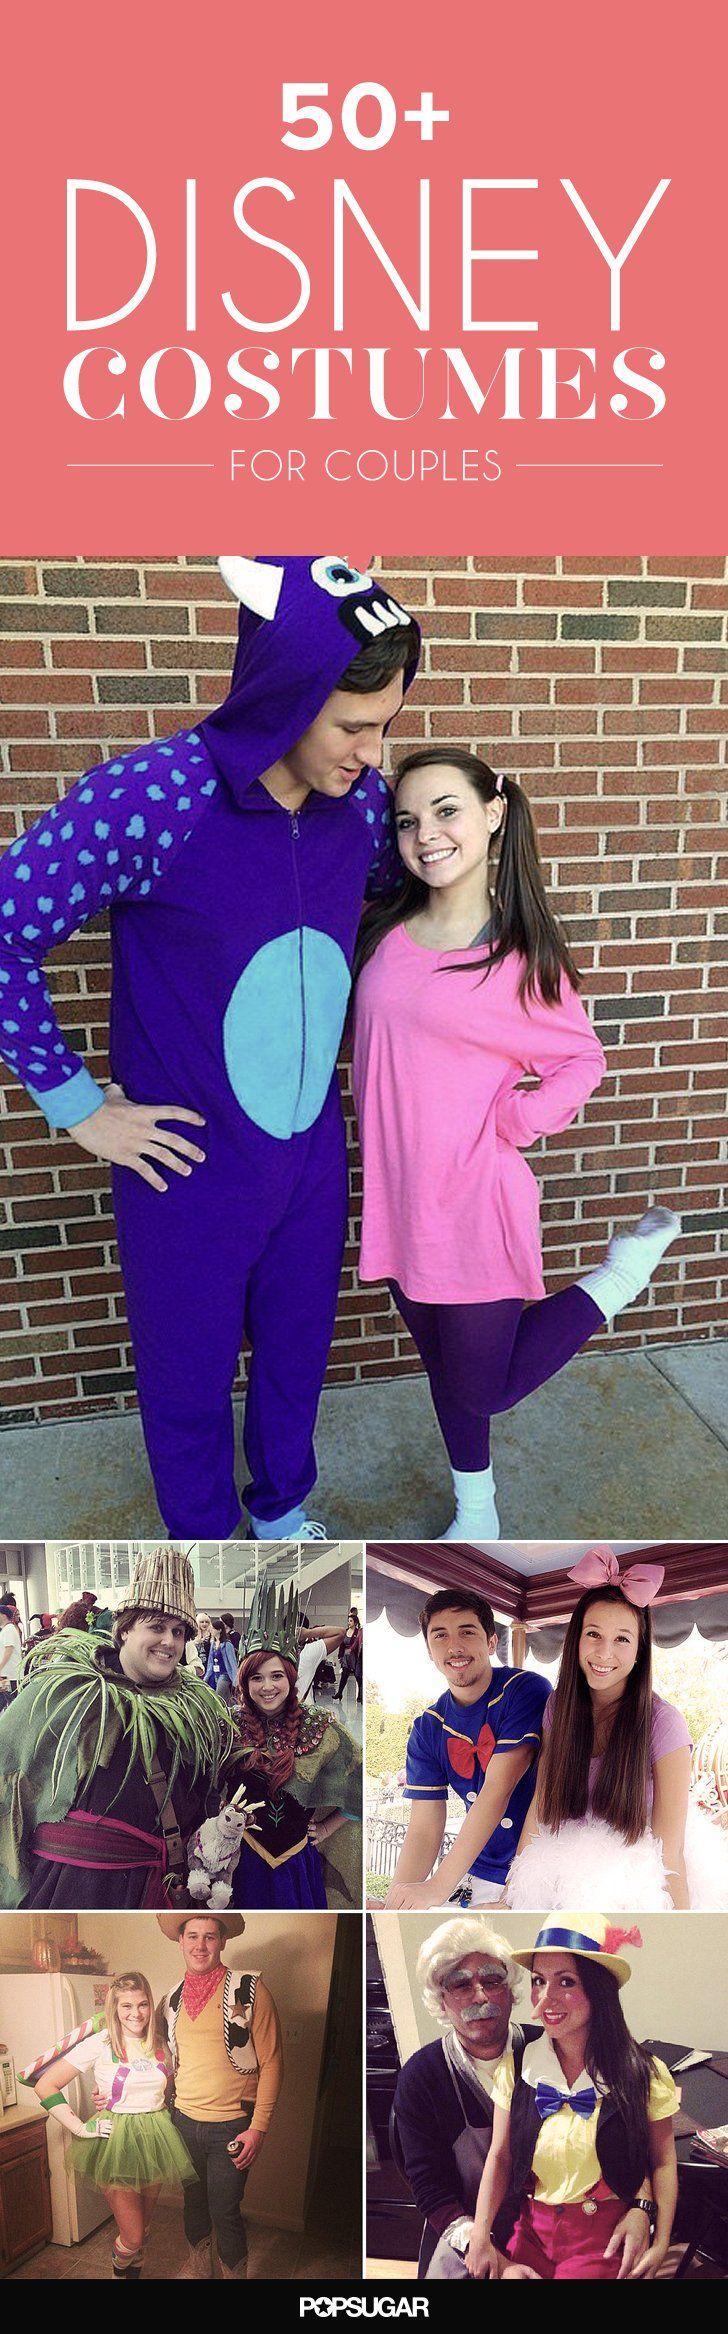 50+ Adorable Disney Couples Costumes